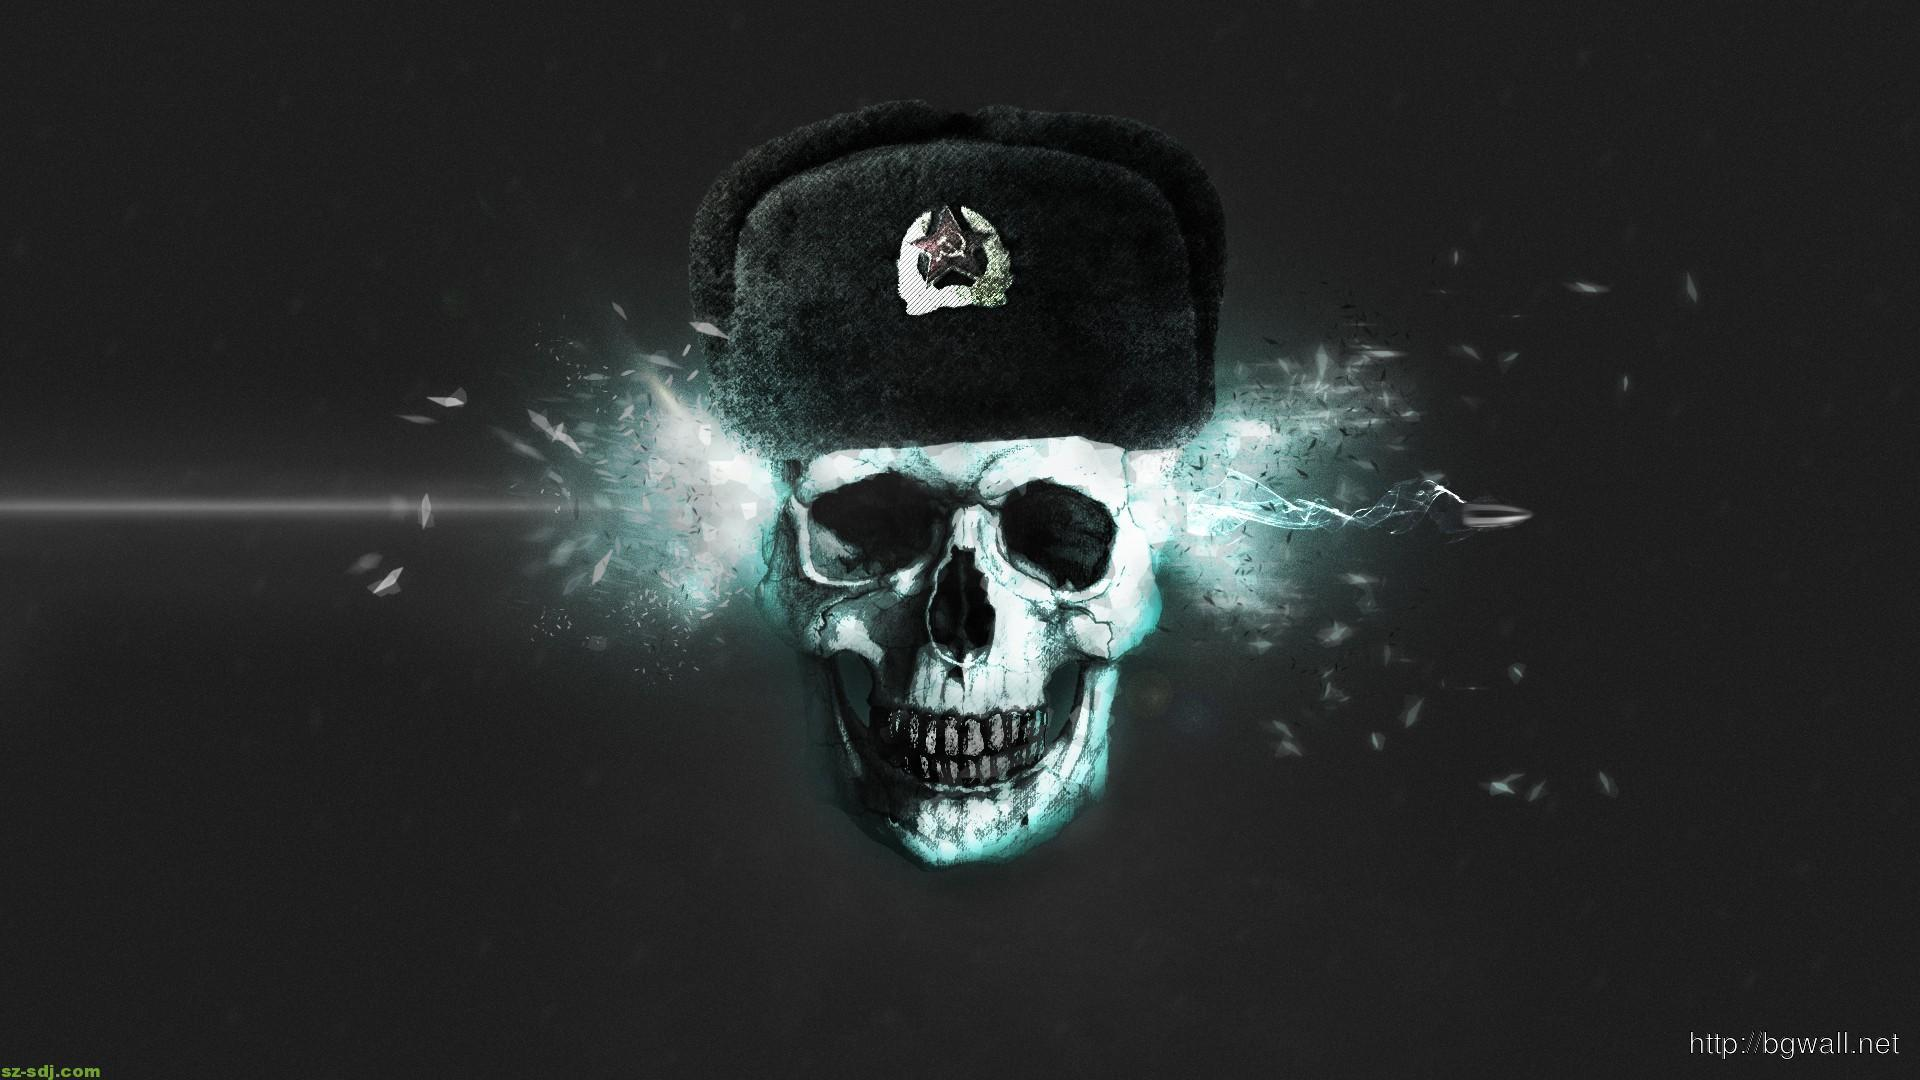 bullet club wallpaper hd,skull,bone,head,font,photography